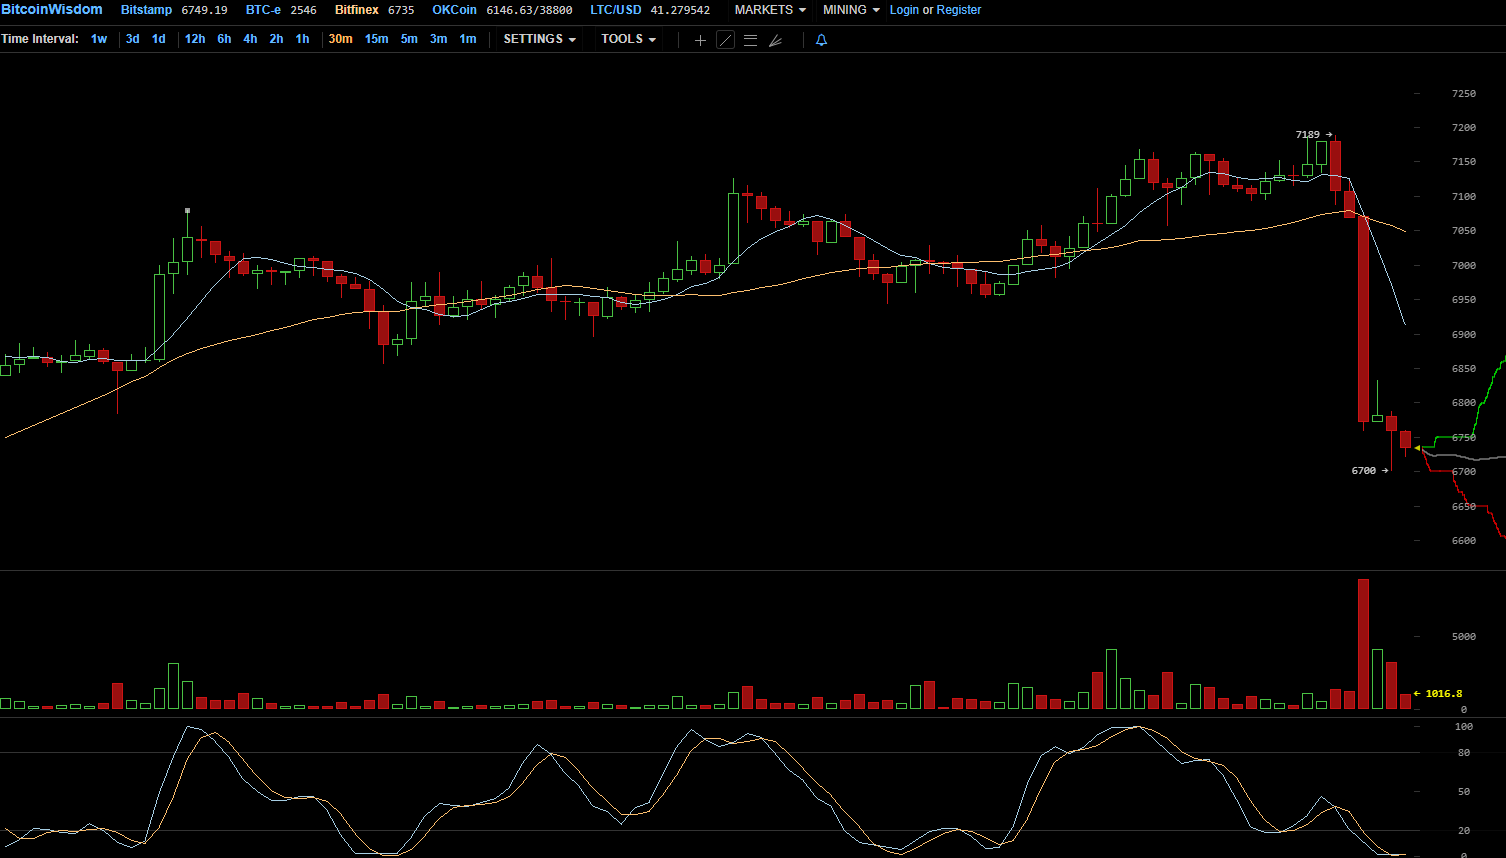 Цена биткоина внезапно просела почти на 0